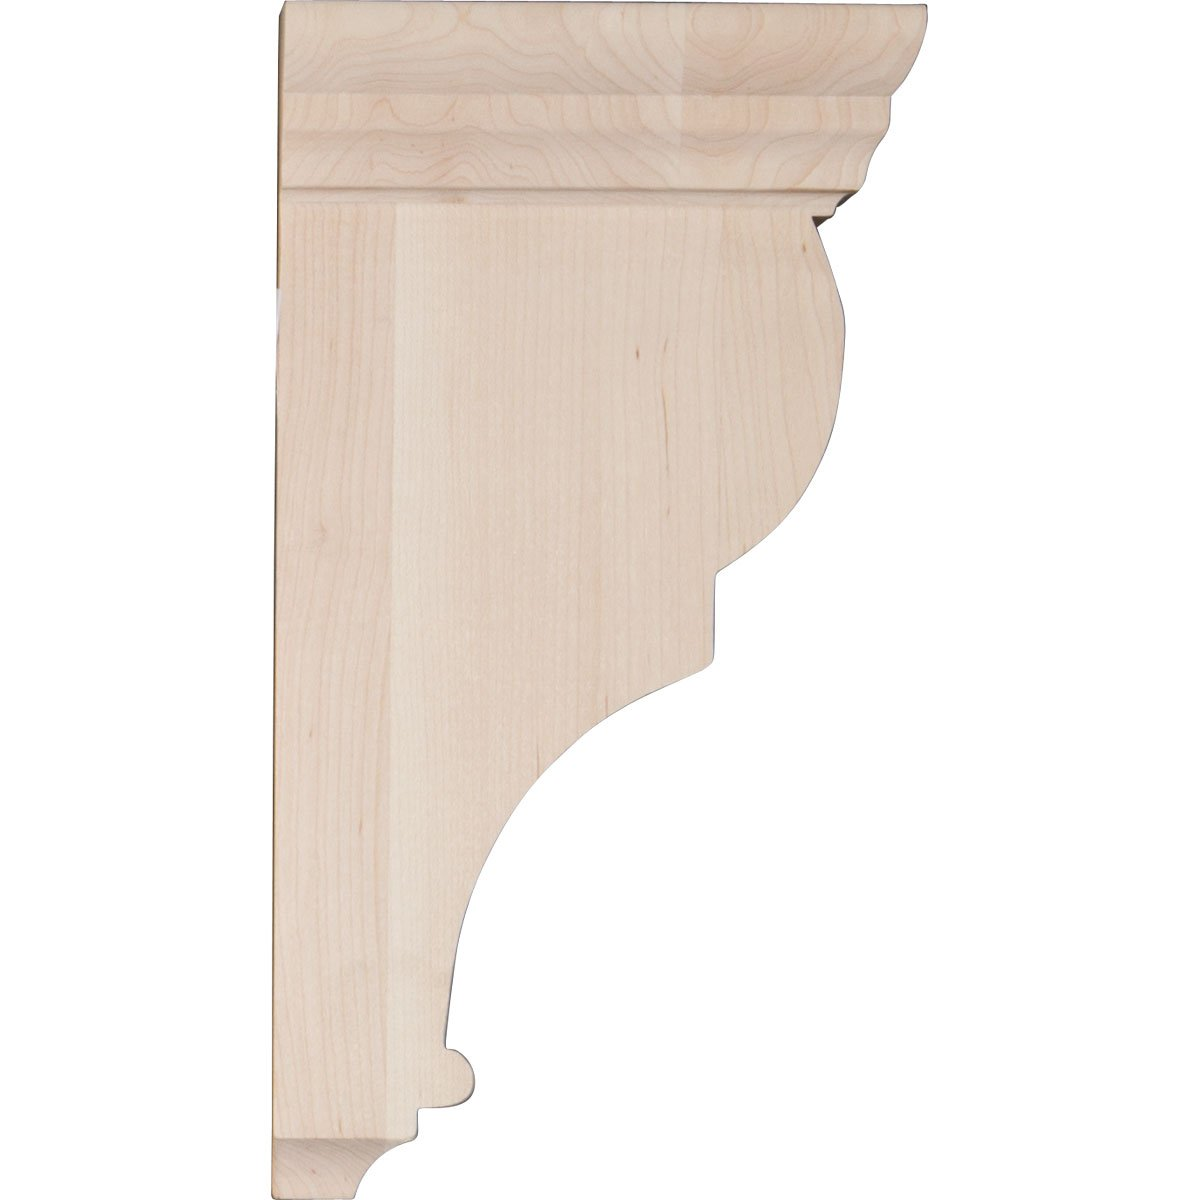 Rubberwood 2 1//2W x 5 1//2D x 10H Ekena Millwork CORW02X05X10RJRW Wood Corbel